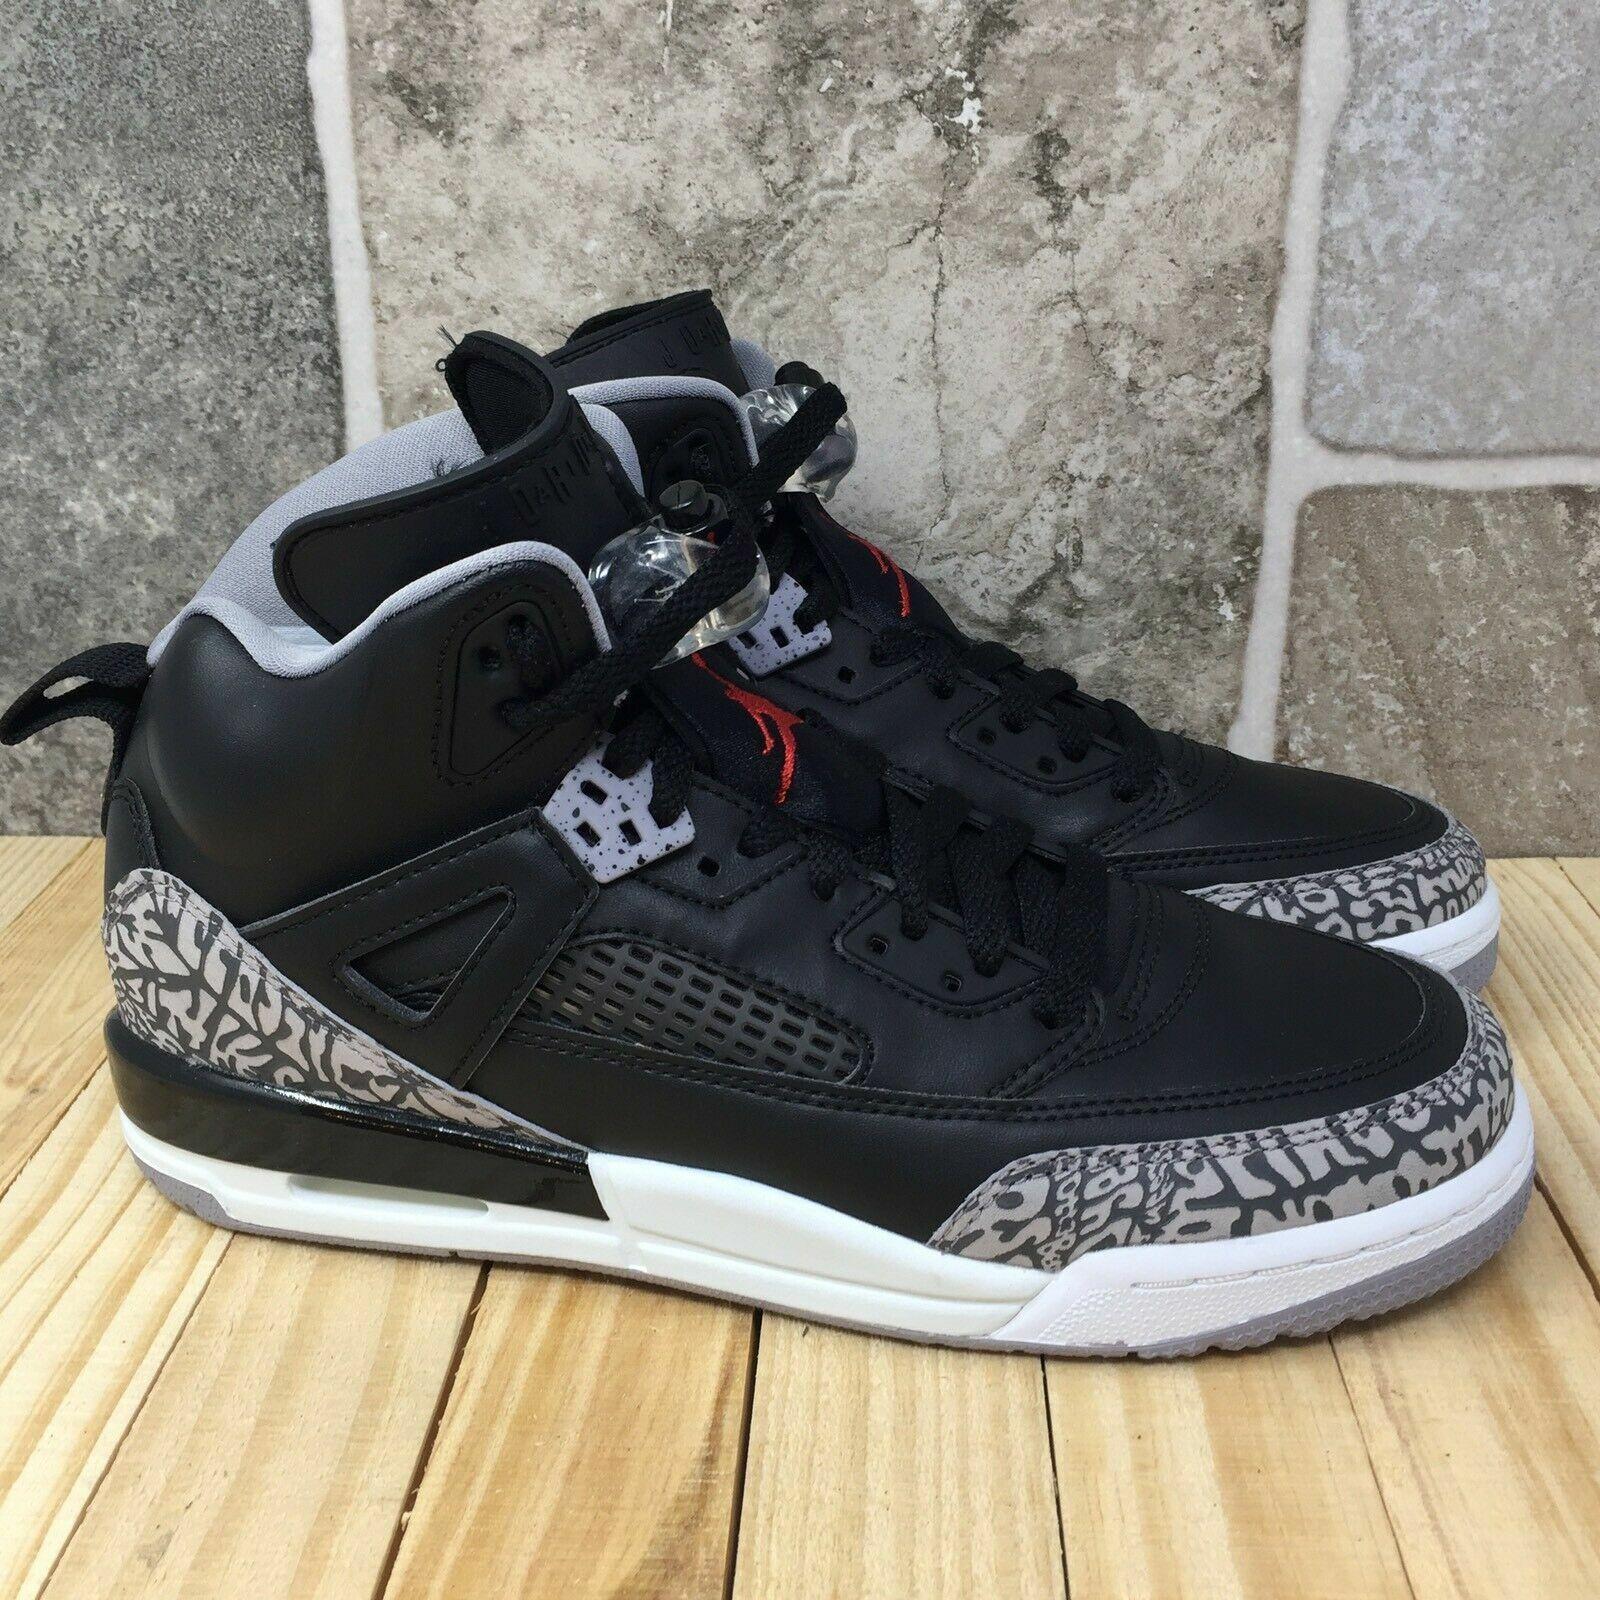 Nike Air Jordan Spizike Black Cement